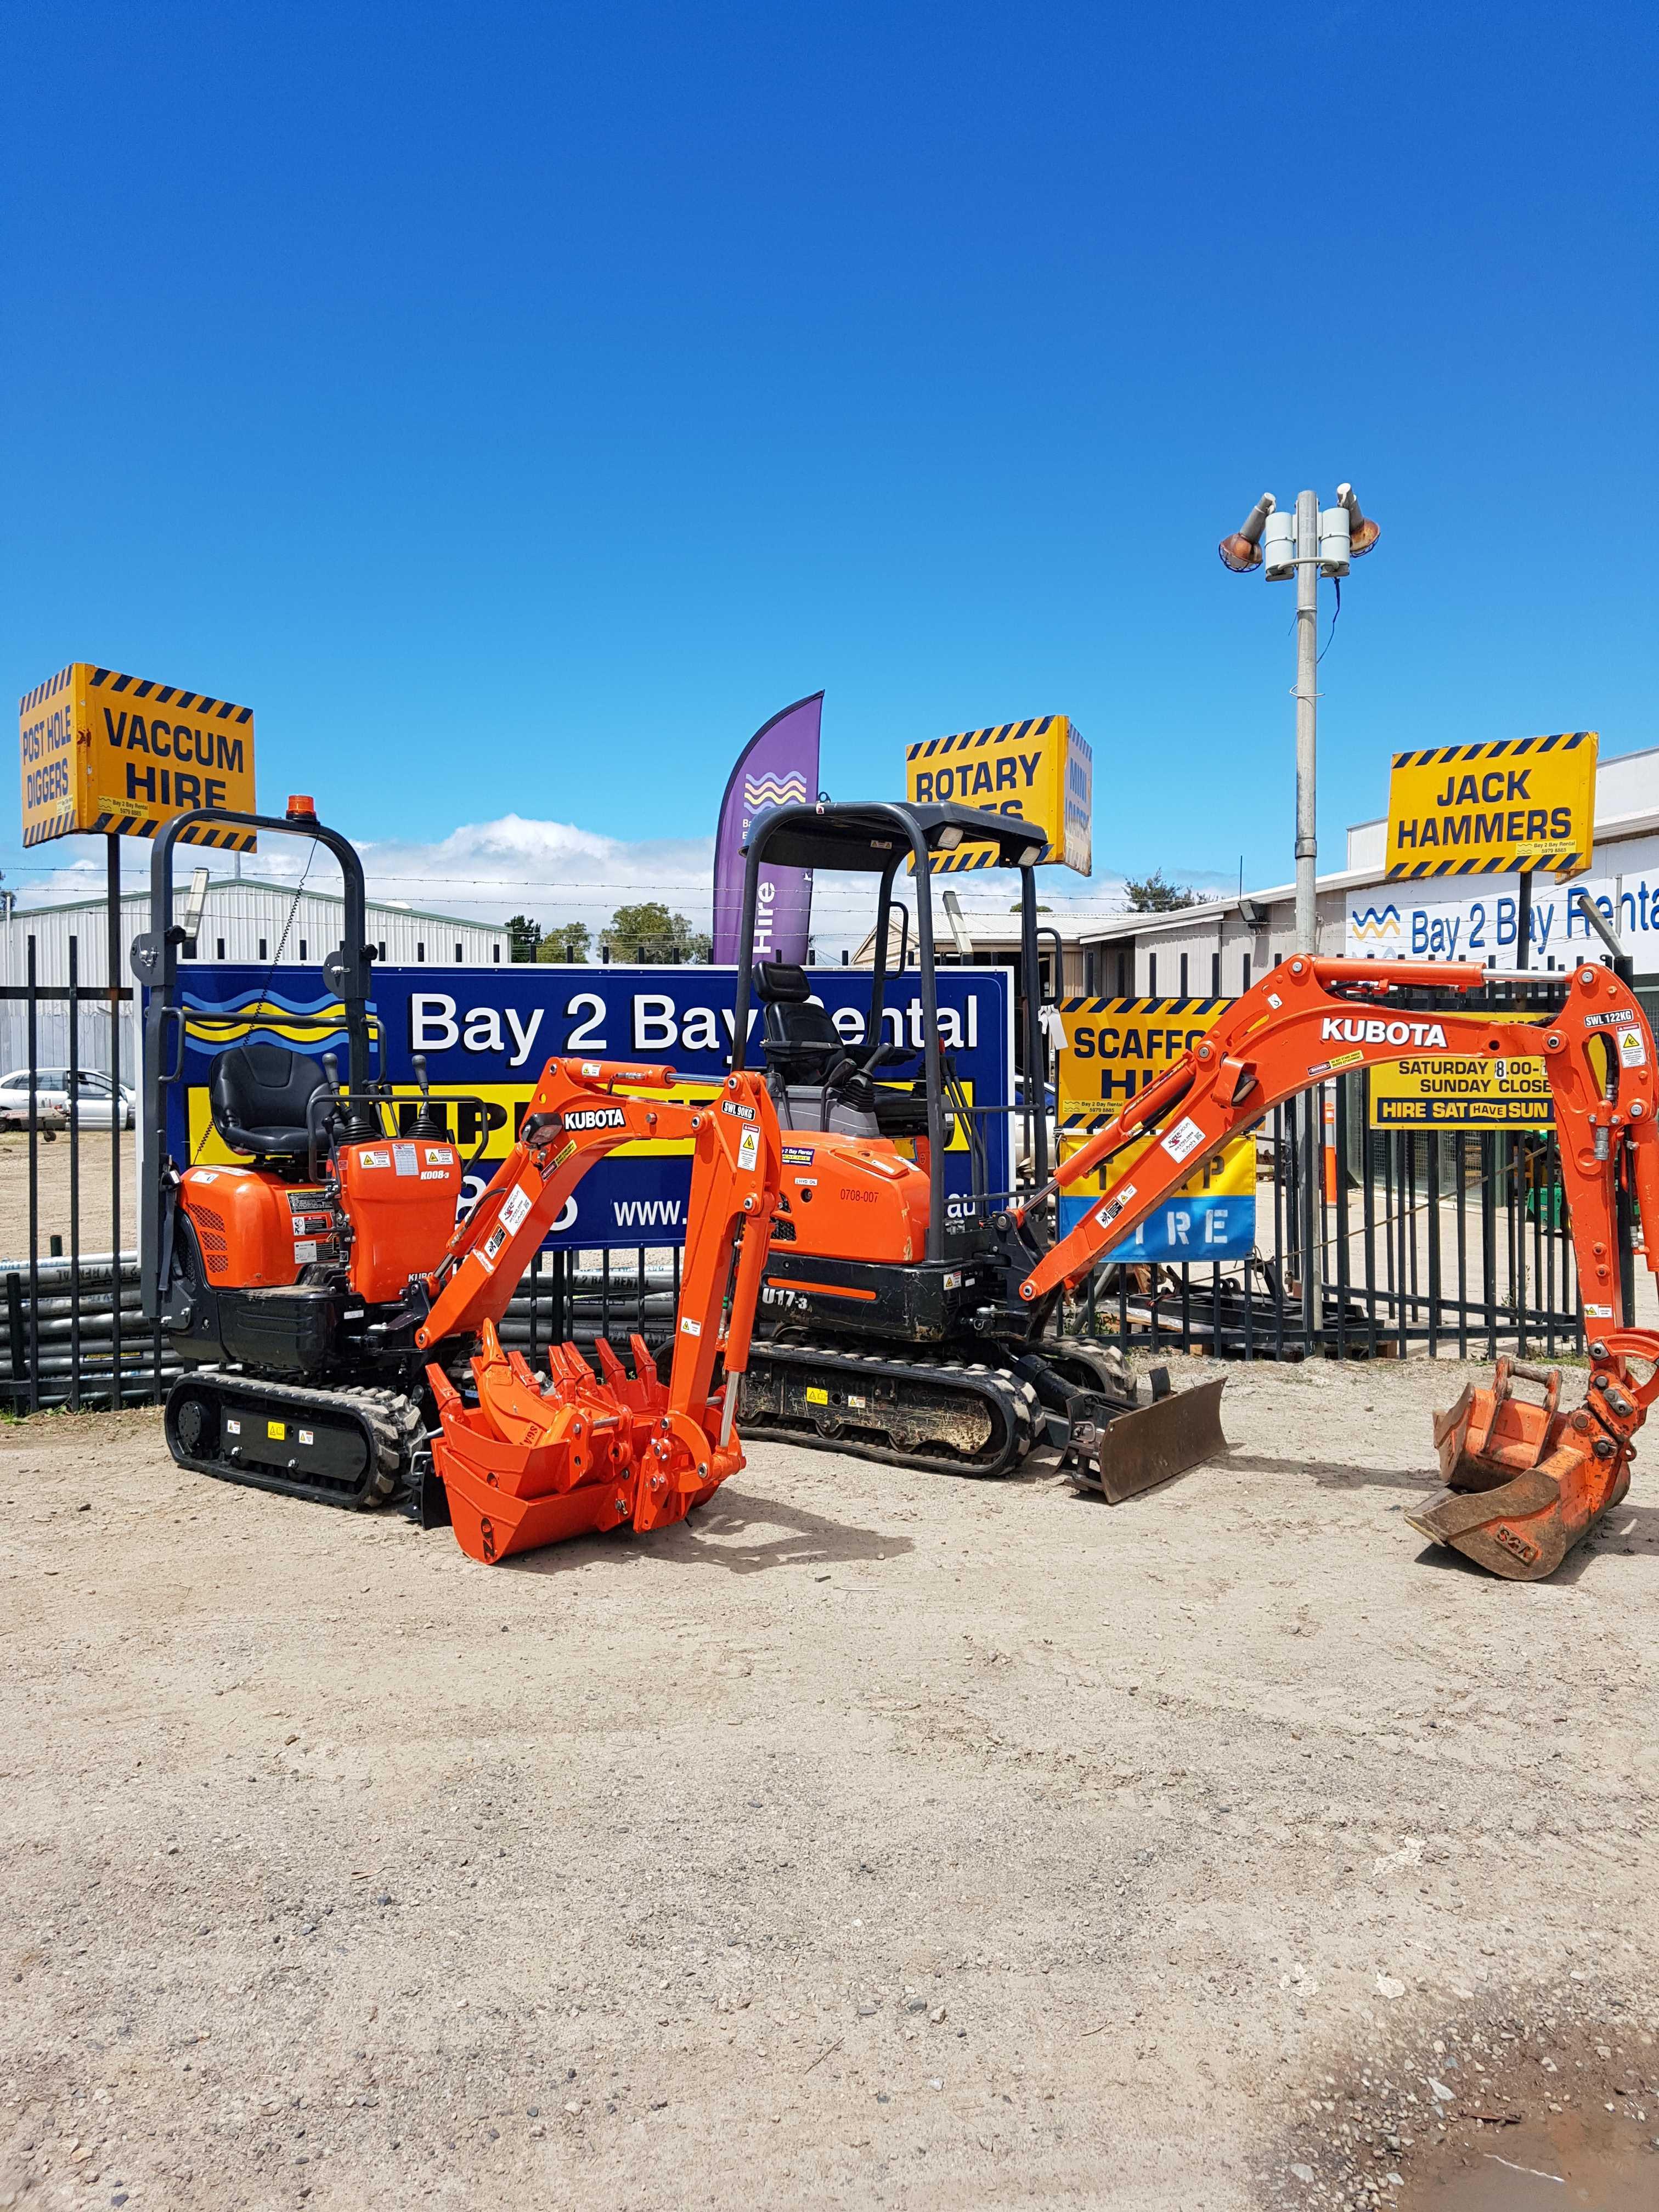 Hire Mini Excavators 1.7t & 1 T